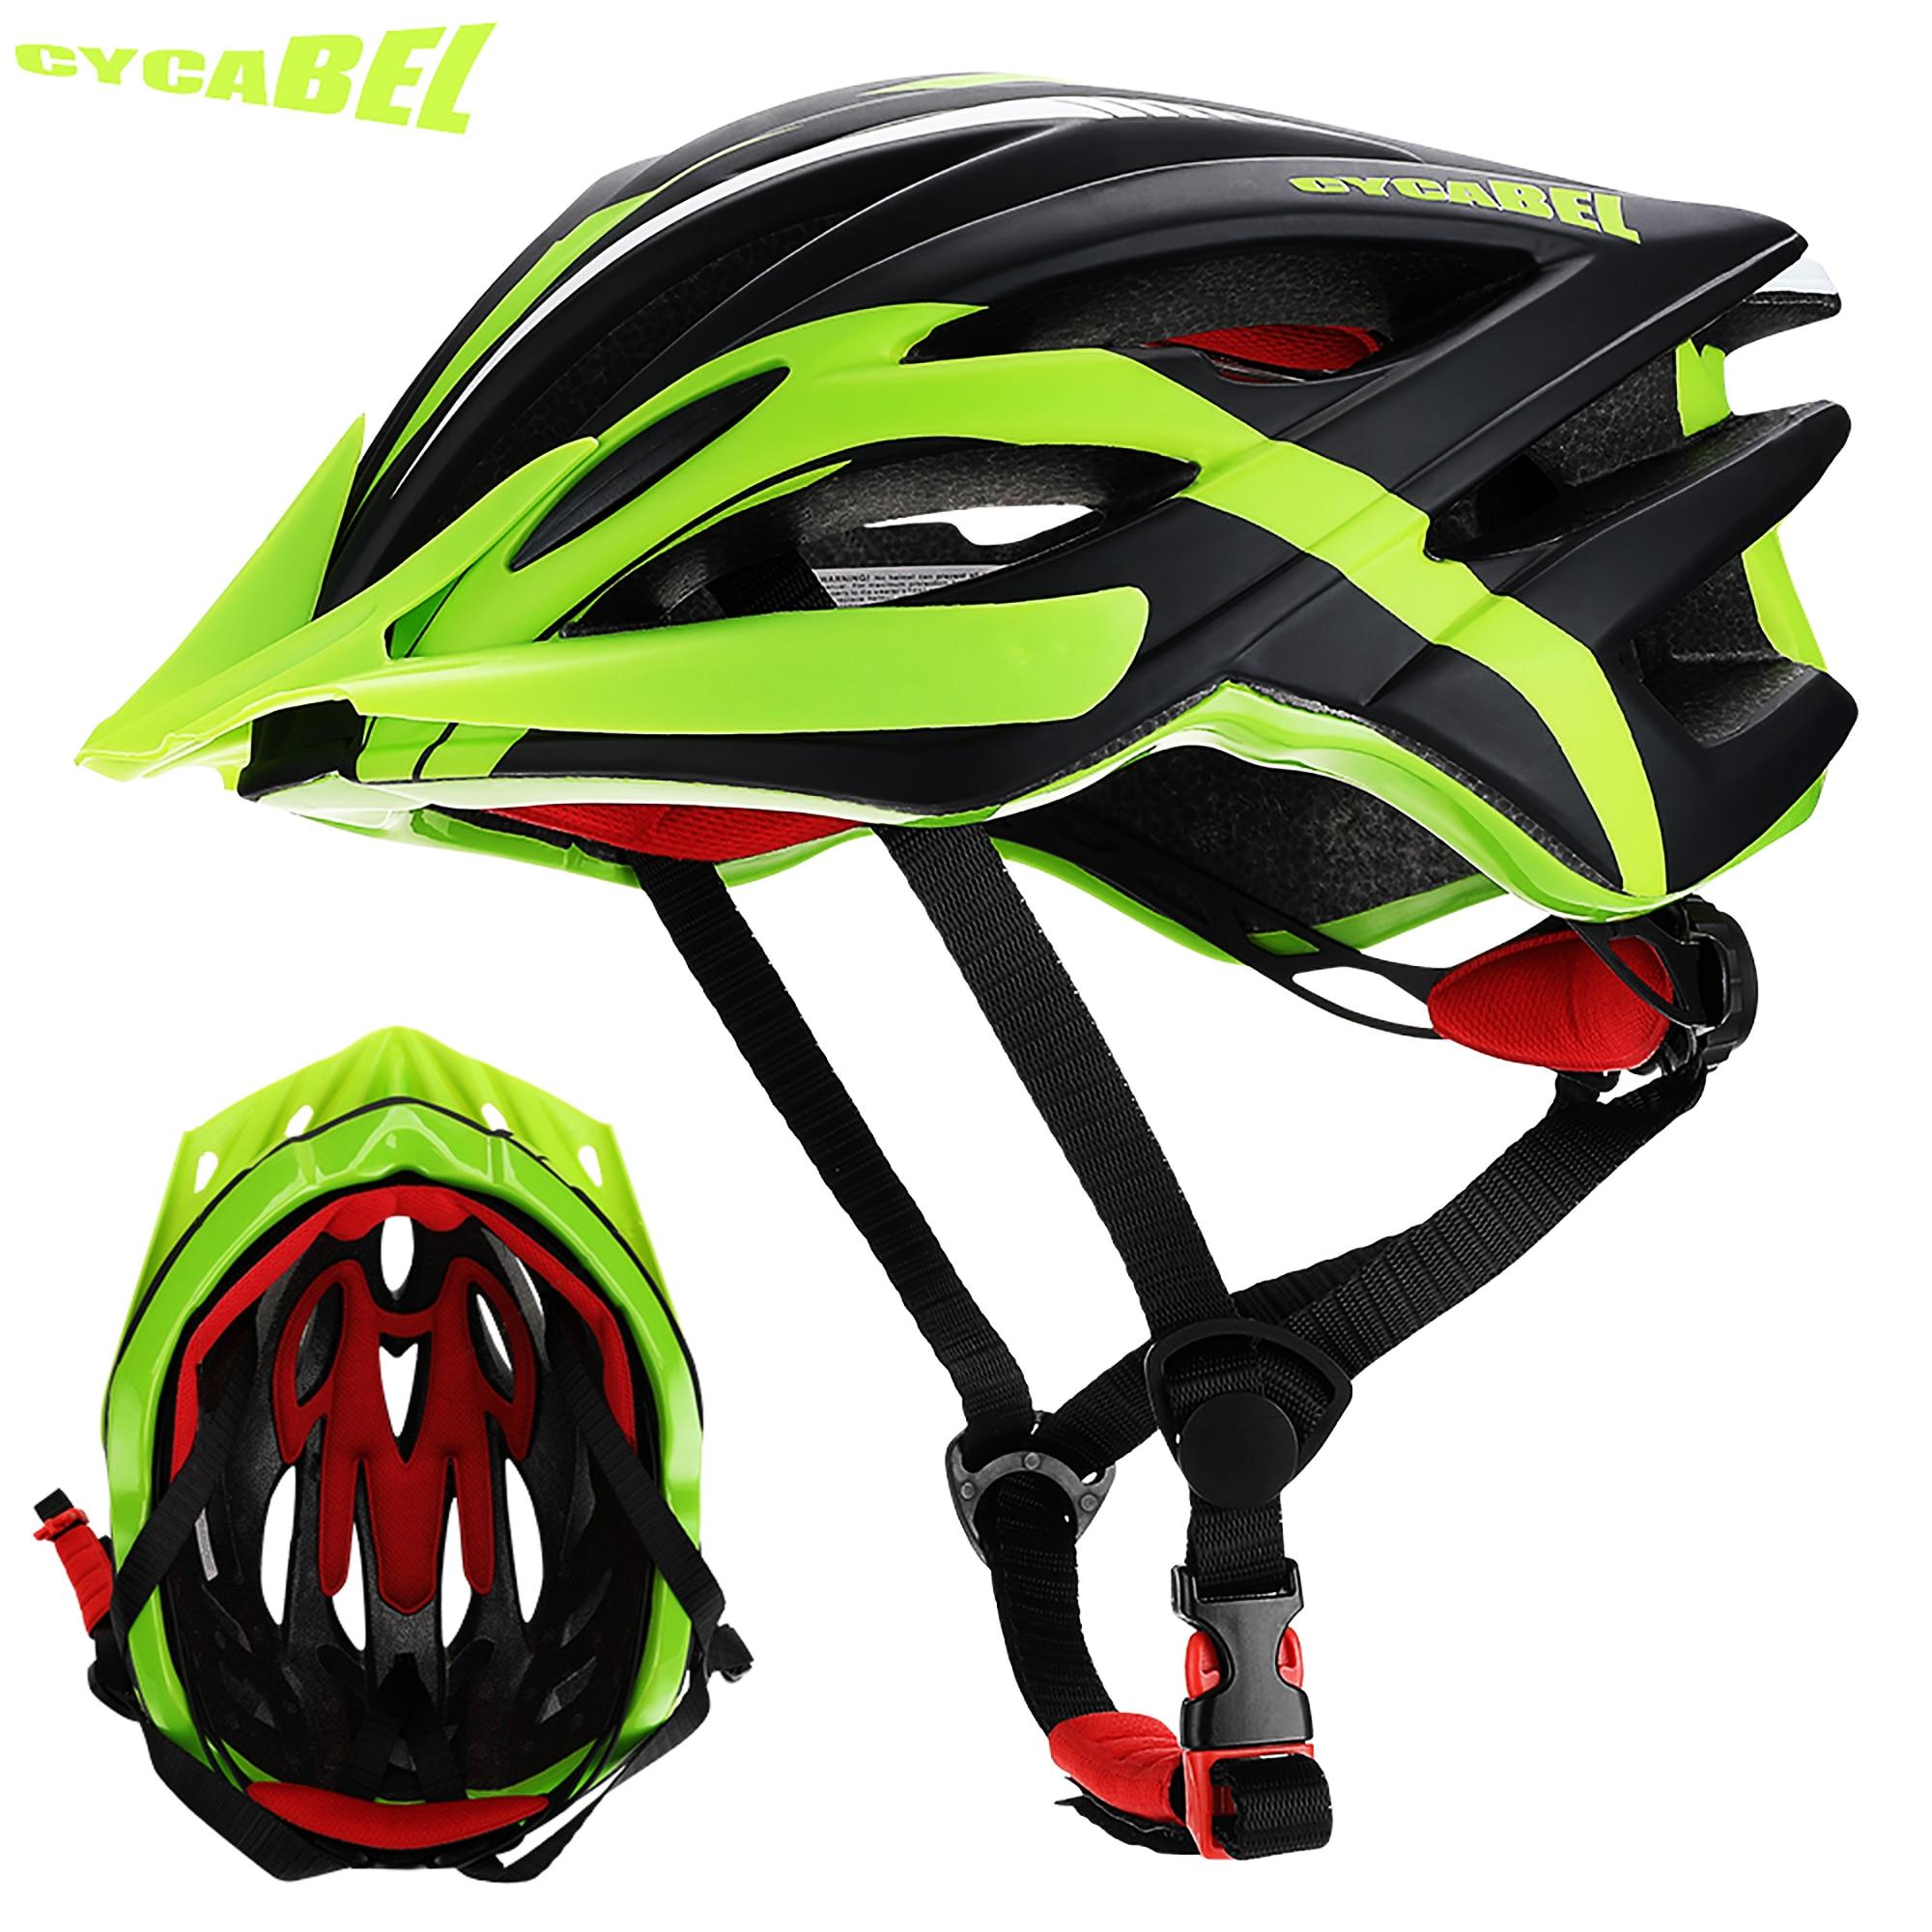 AliExpress - CYCABEL Bicycle Helmet Cycling Safe Hat In-mold Road Mountain Bike Helmet Ultralight MTB All-terrain Sport Riding Cycling Helmet